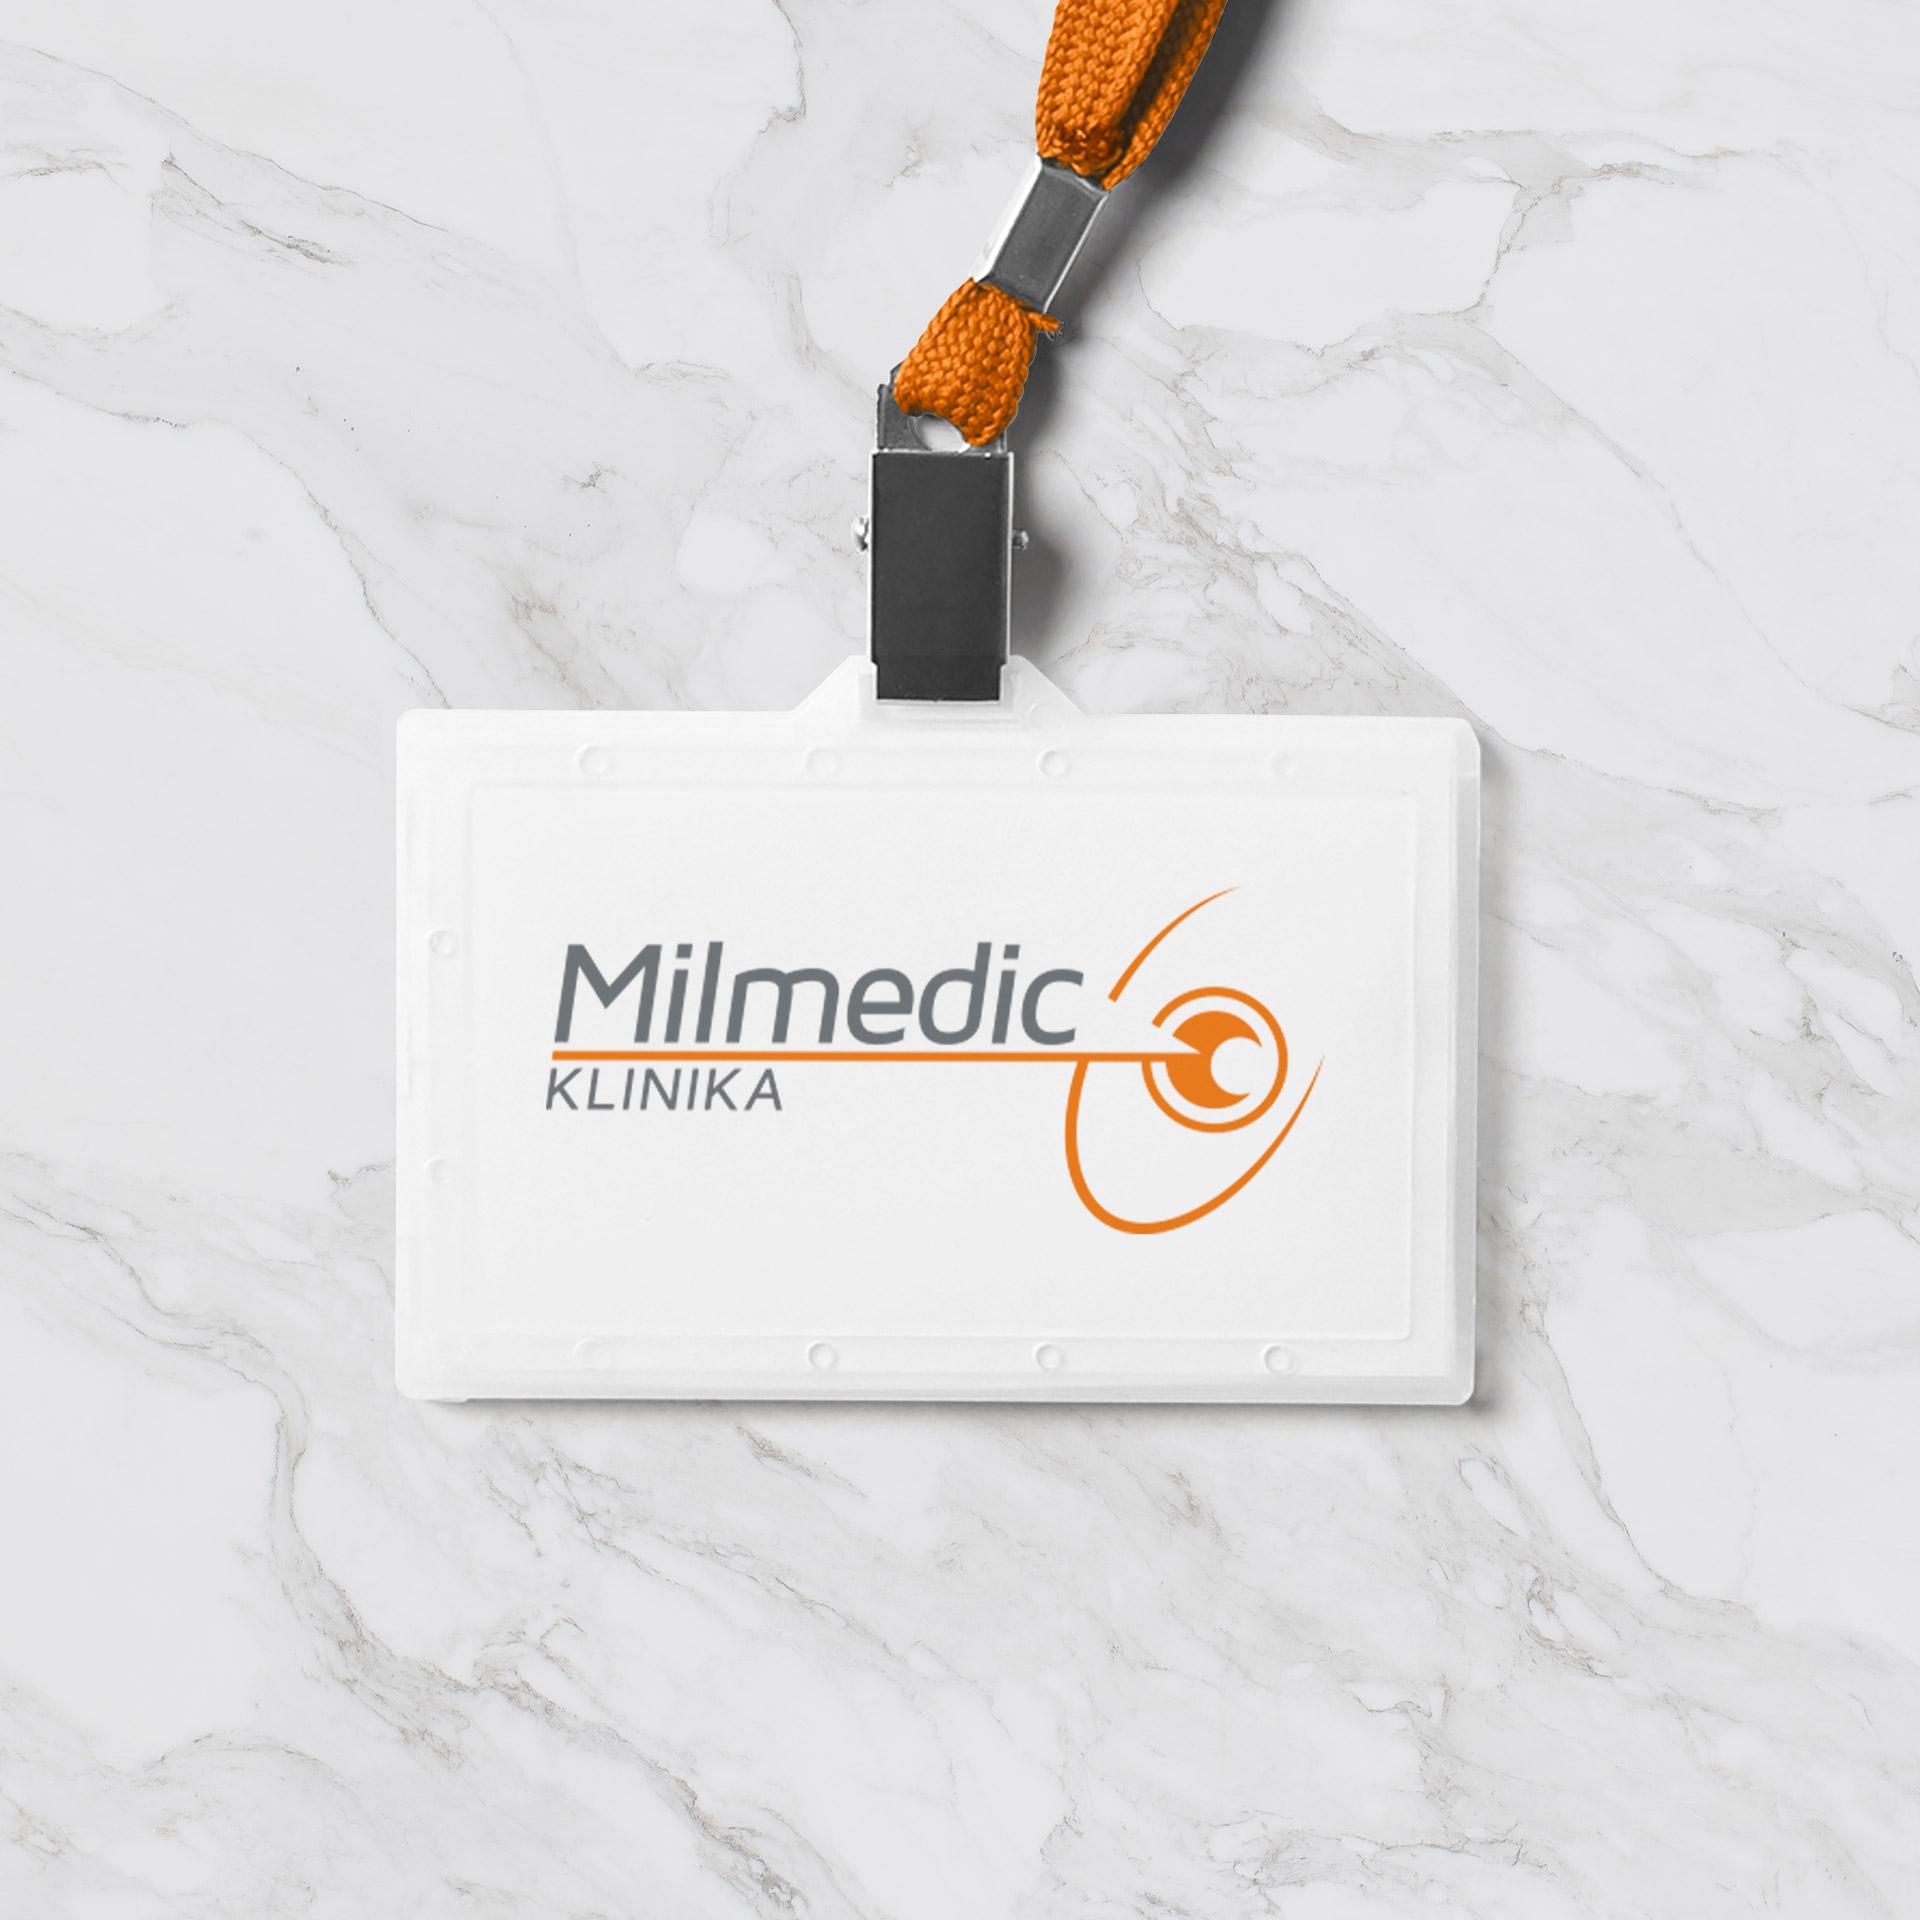 Dizajn i izrada logotipa za Milmedic kliniku iz Beograda